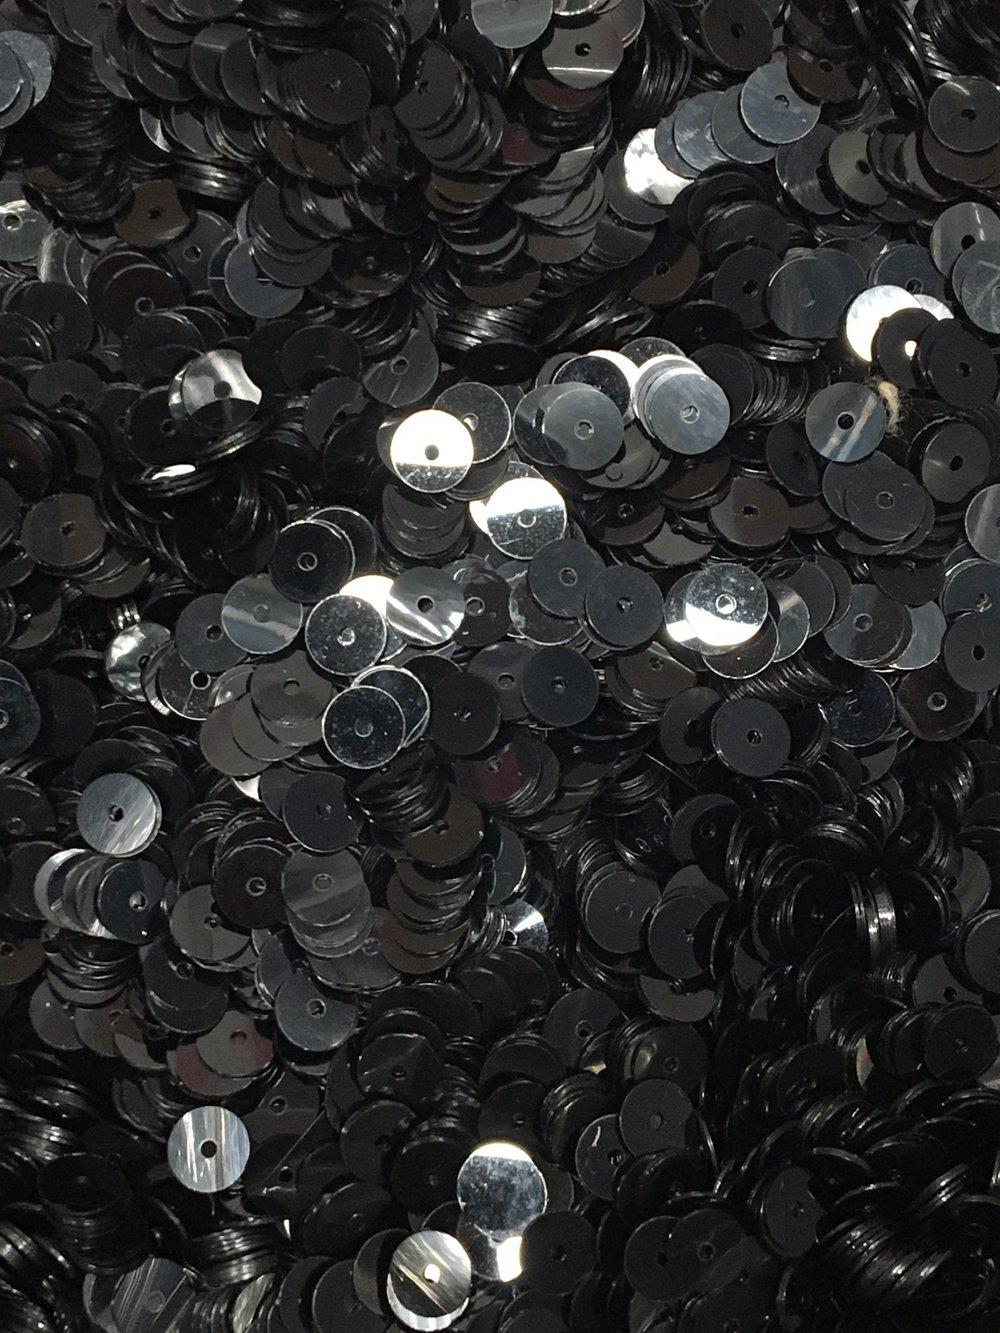 5mm Flat SequinsShiny Black - Bulk Loose Sequins (1/4 & 1/2 Pound)